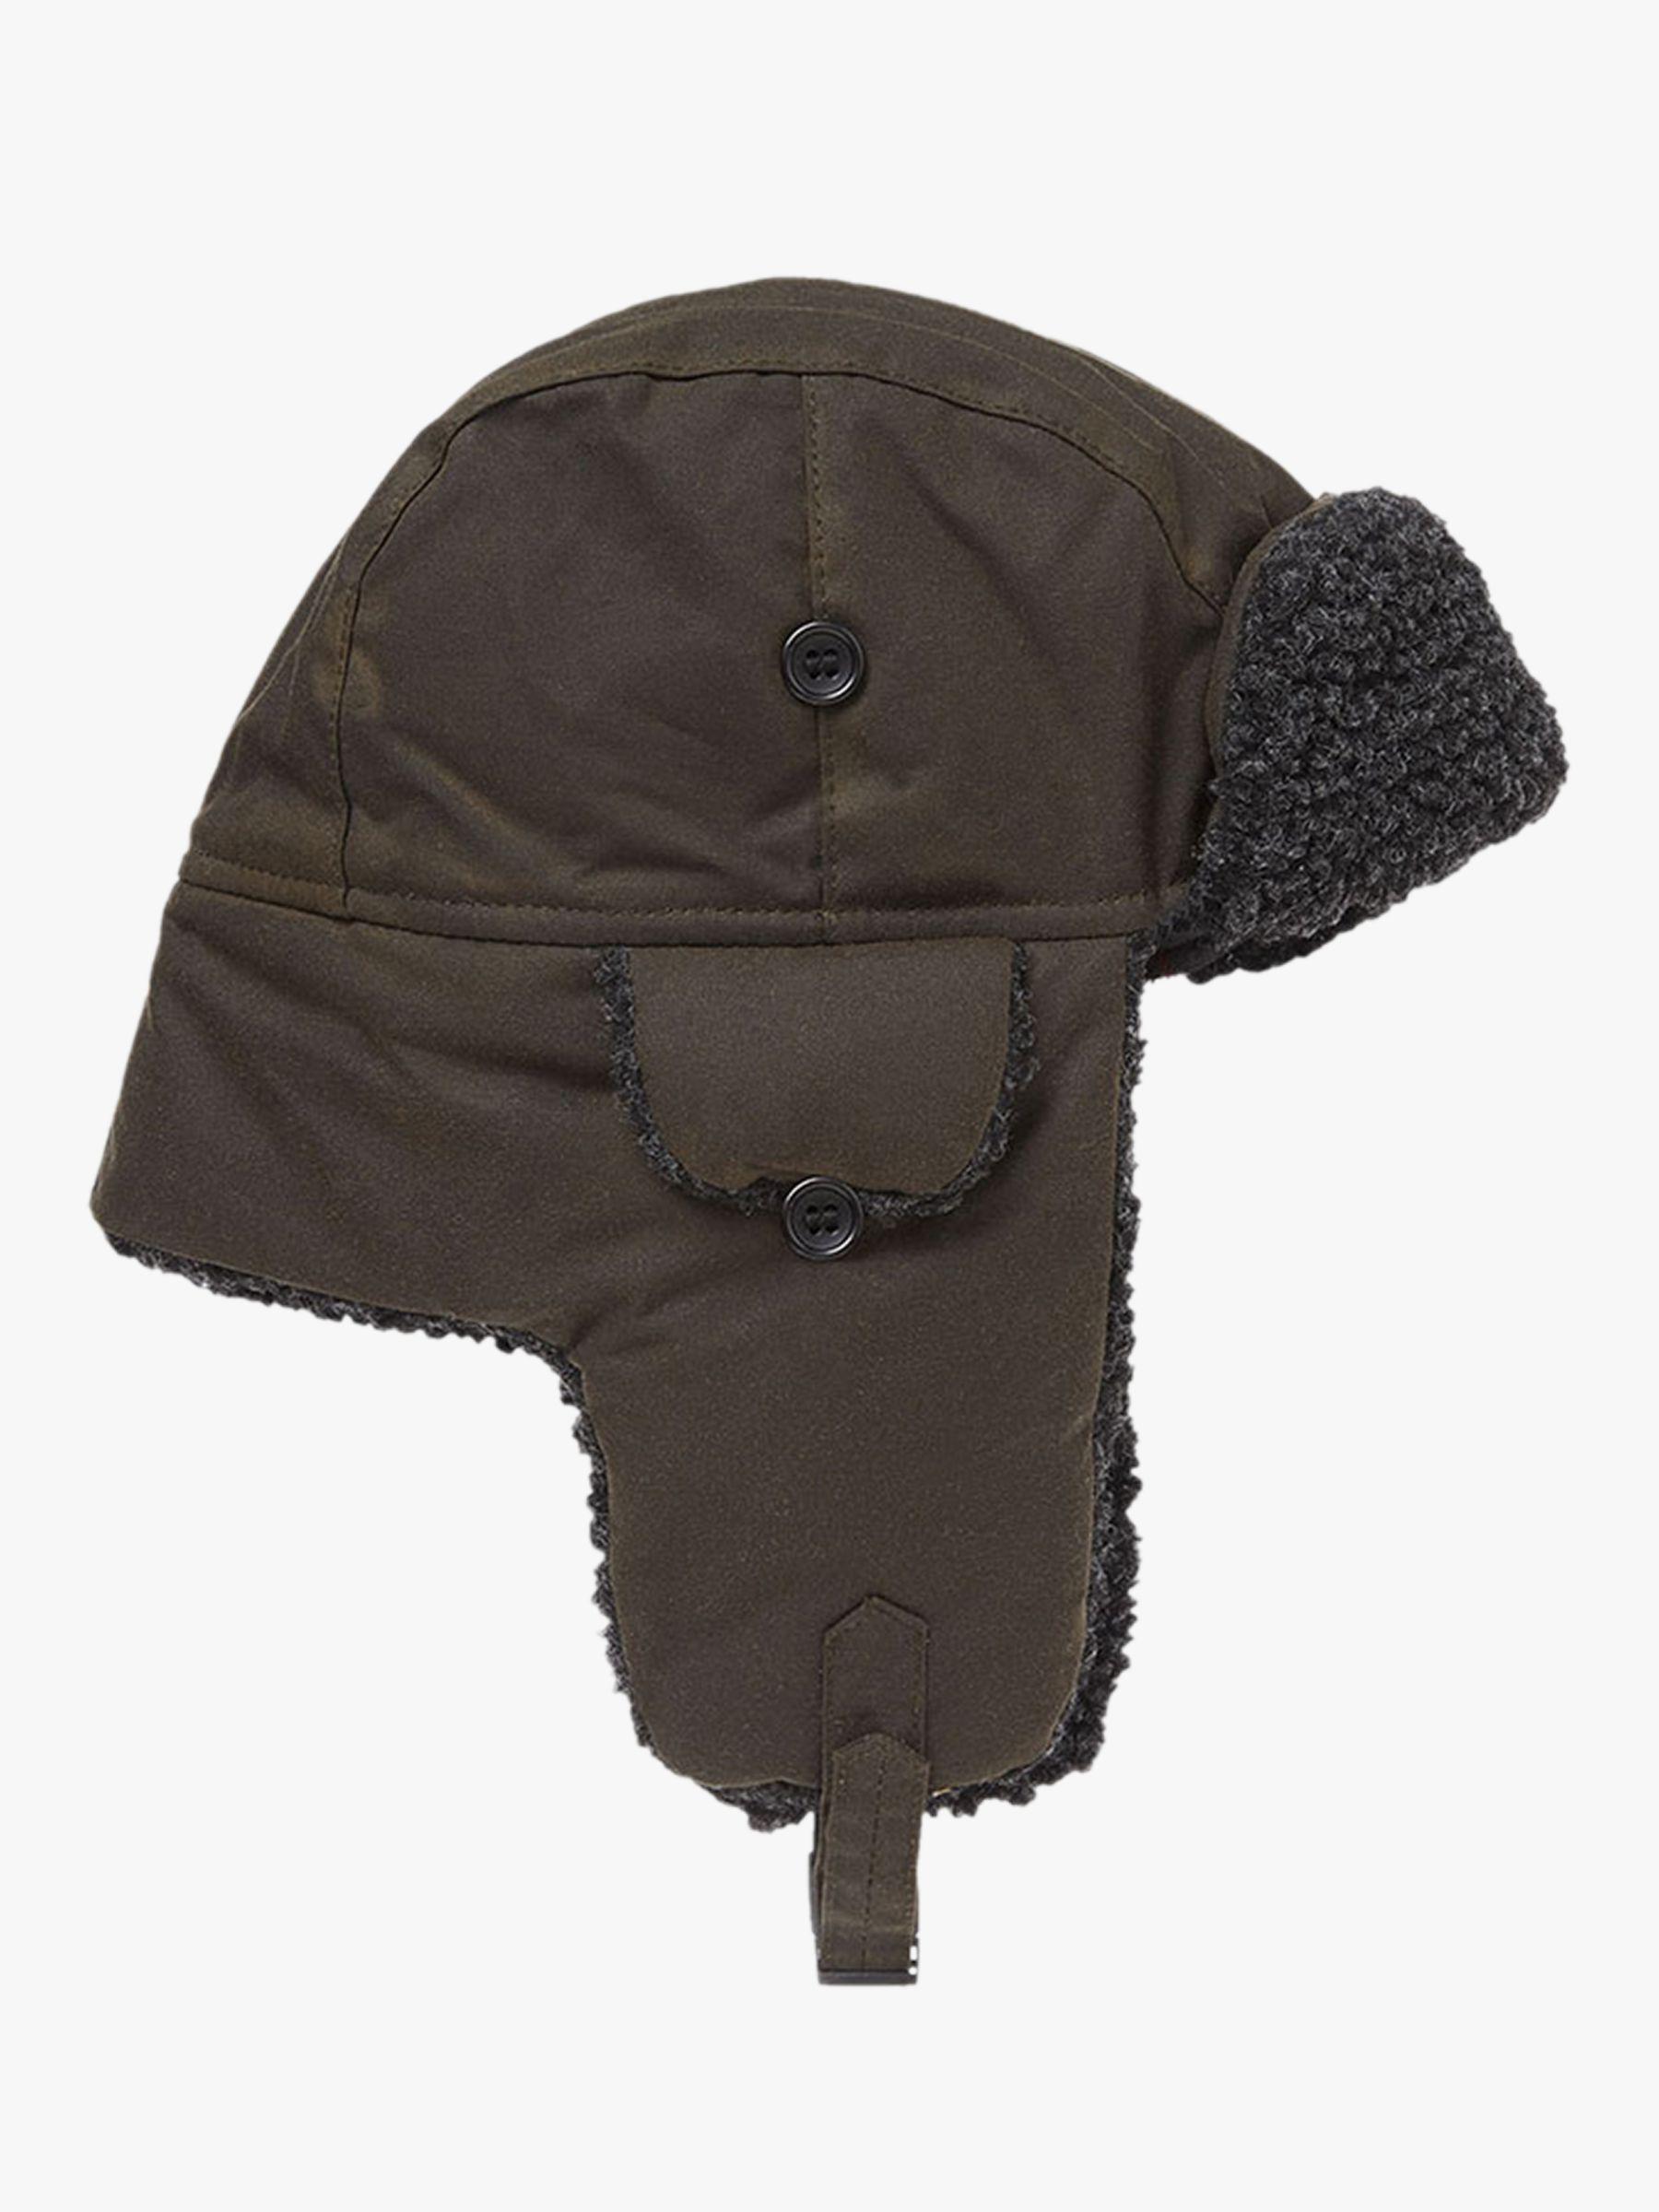 29a10b3bfa8fb Barbour Fleece Lined Trapper Hat in Green for Men - Lyst